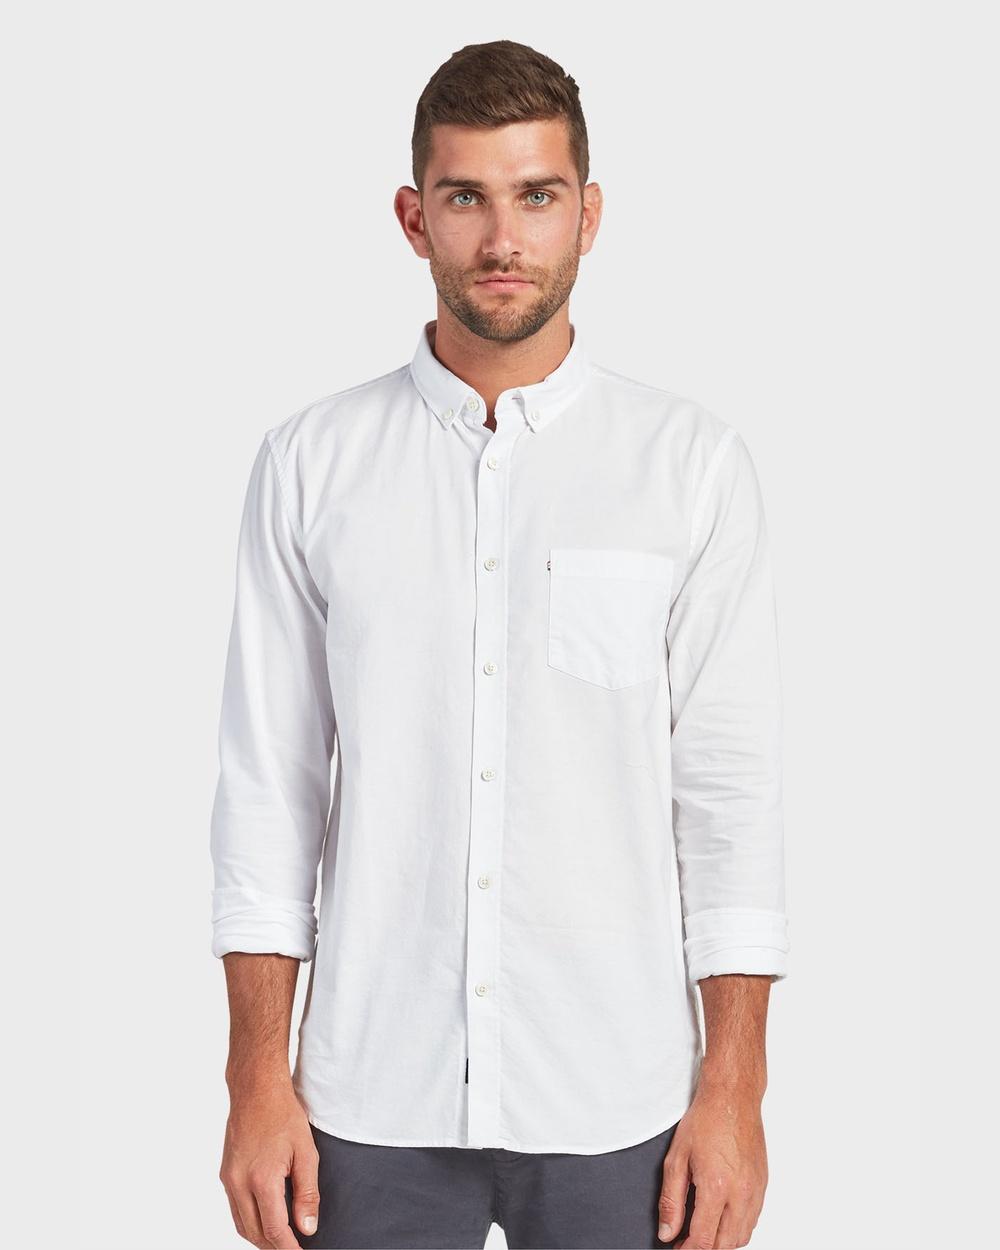 Academy Brand Dillon Shirt Shirts & Polos White